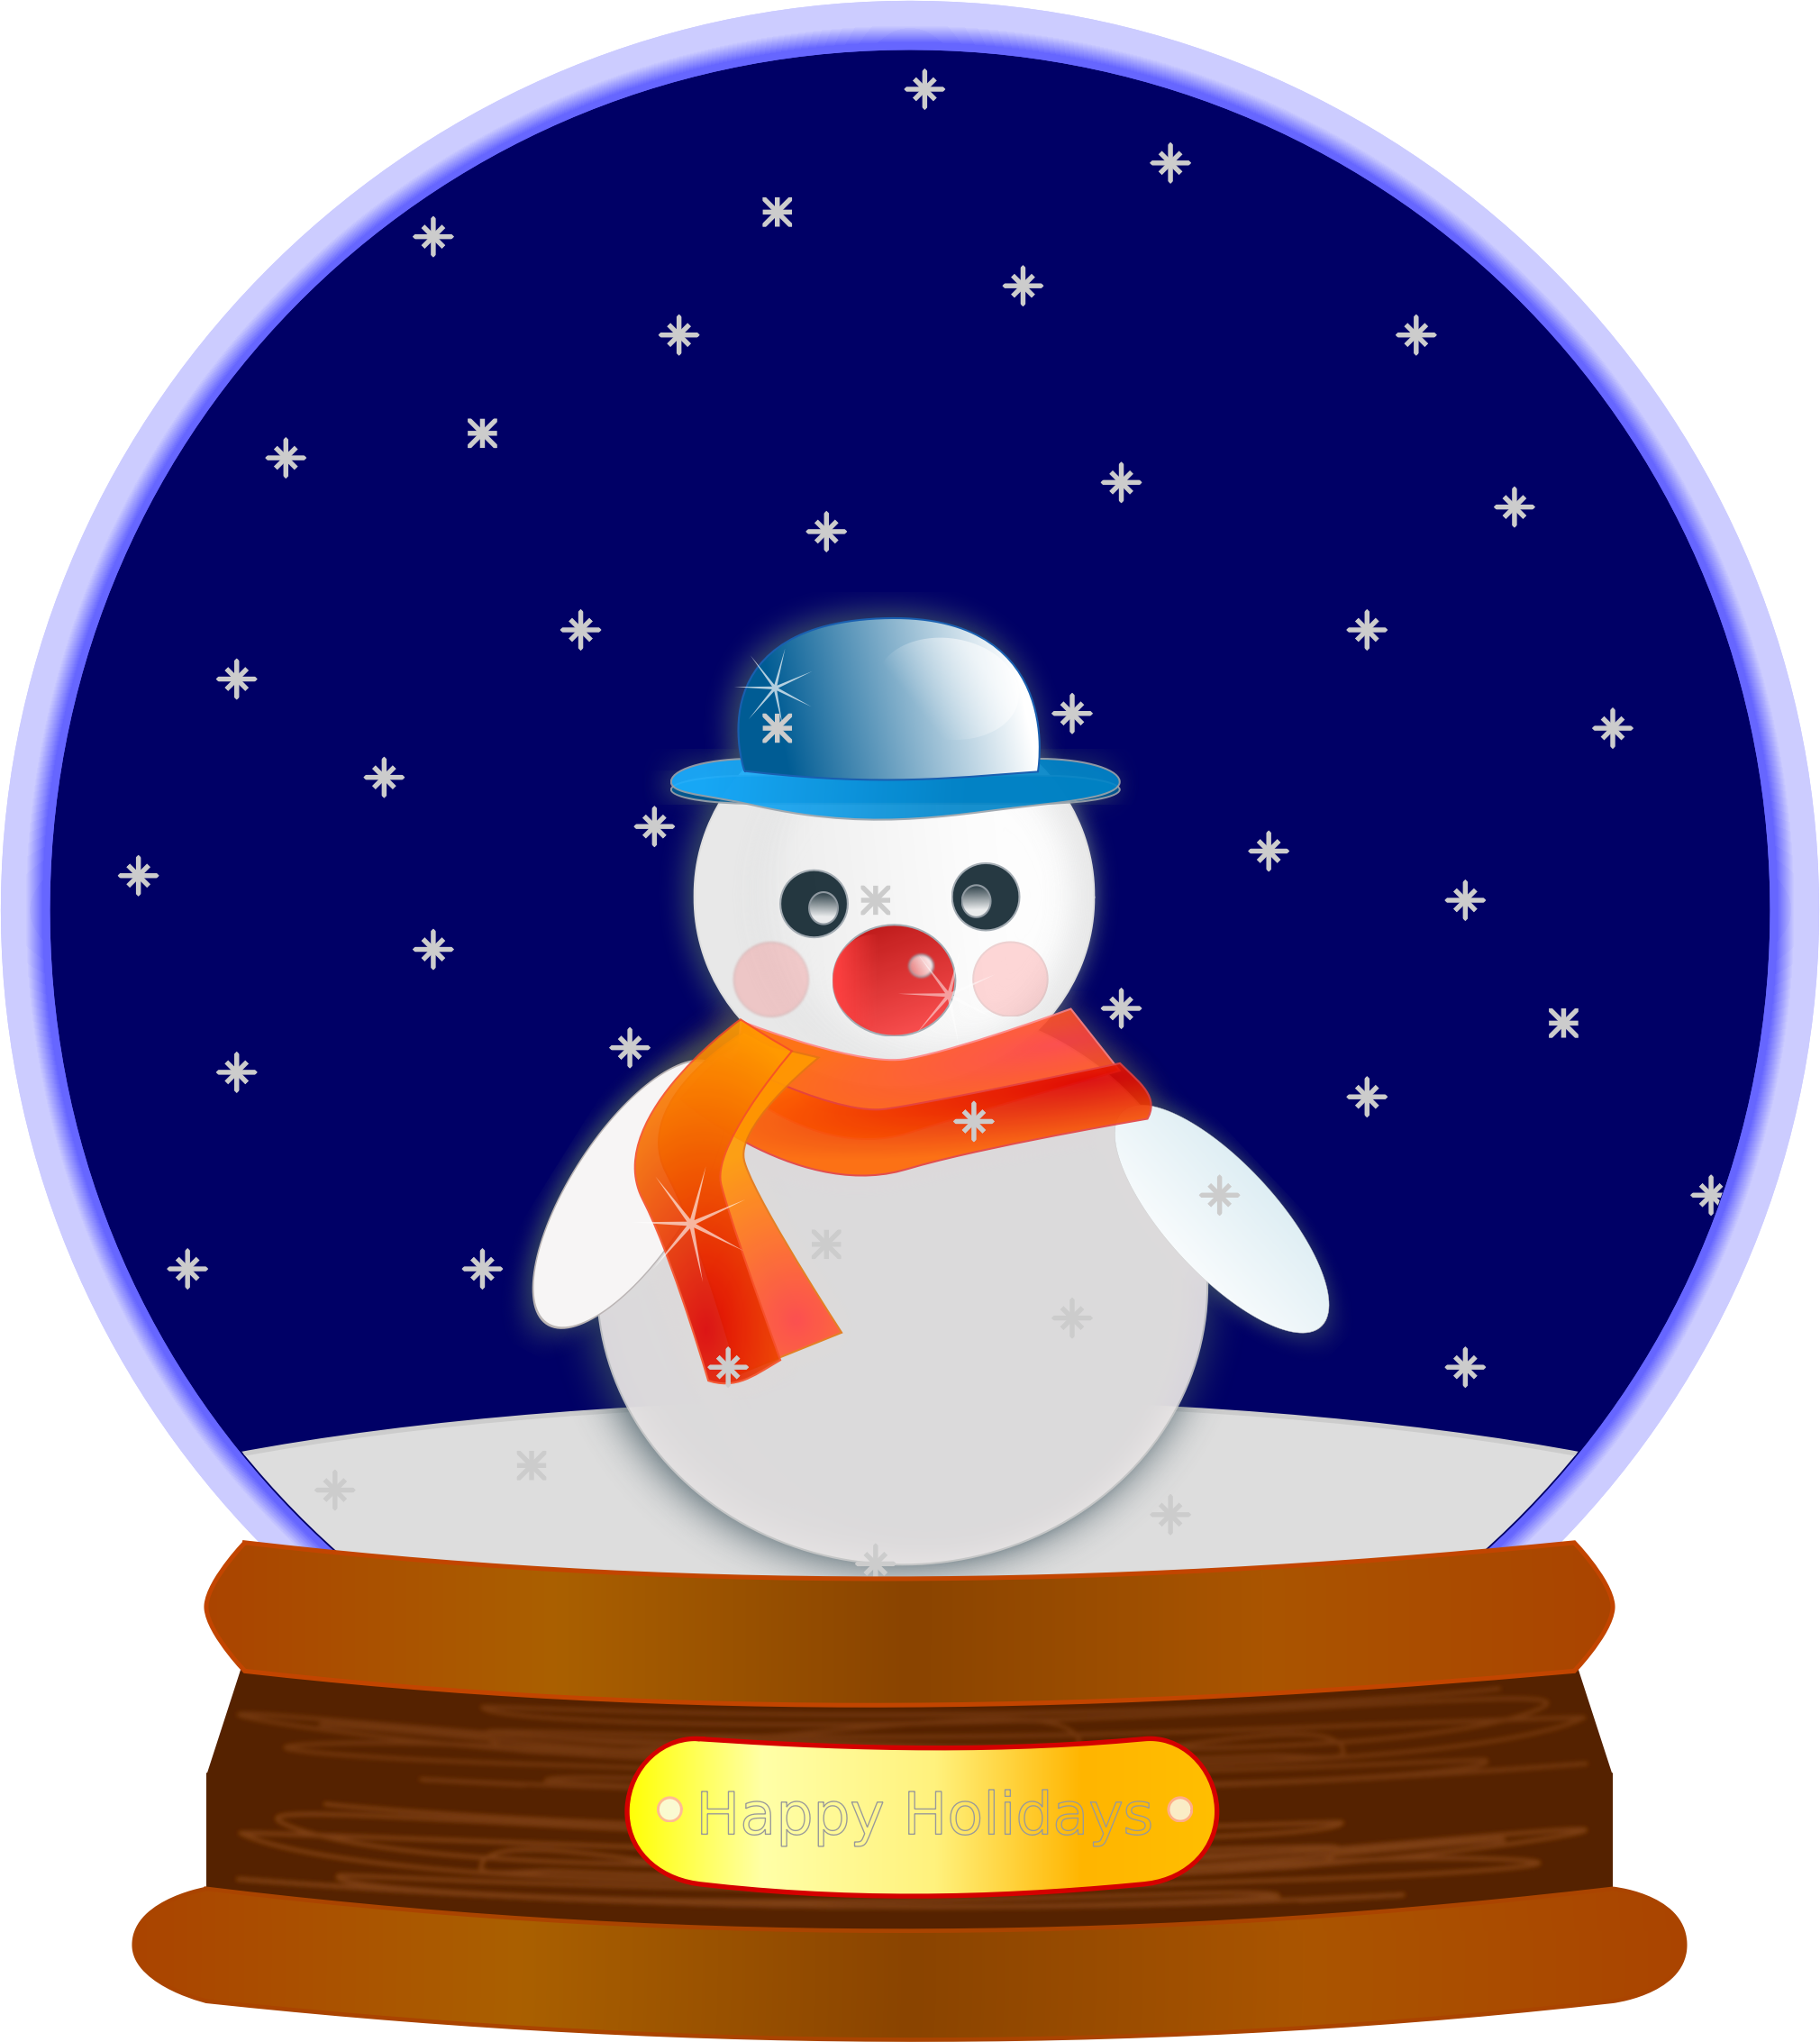 Snowman snow globe clipart jpg transparent stock Snow Globe Clipart   All About Christmas   Snow globes ... jpg transparent stock